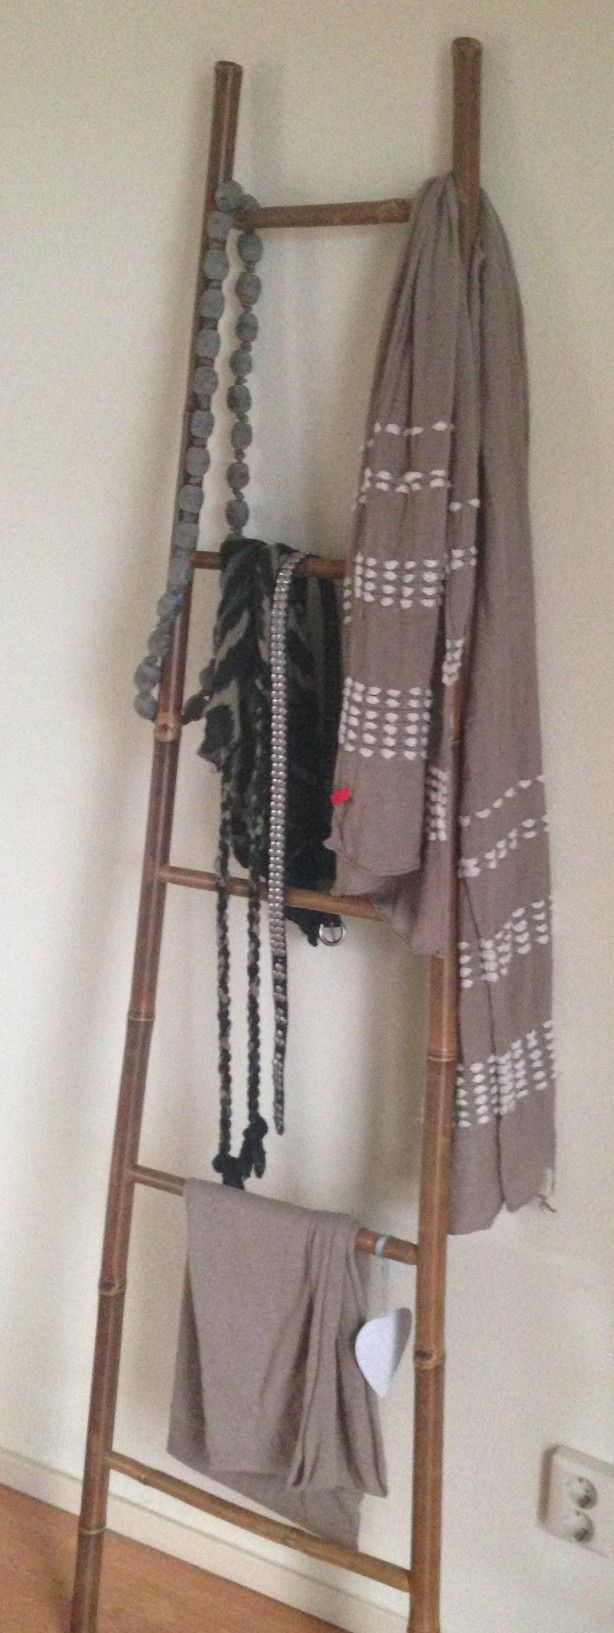 Badkamer Met Zelliges ~   over Bamboe Ladders op Pinterest  Bamboe, Ladders en Bamboe Ambachten